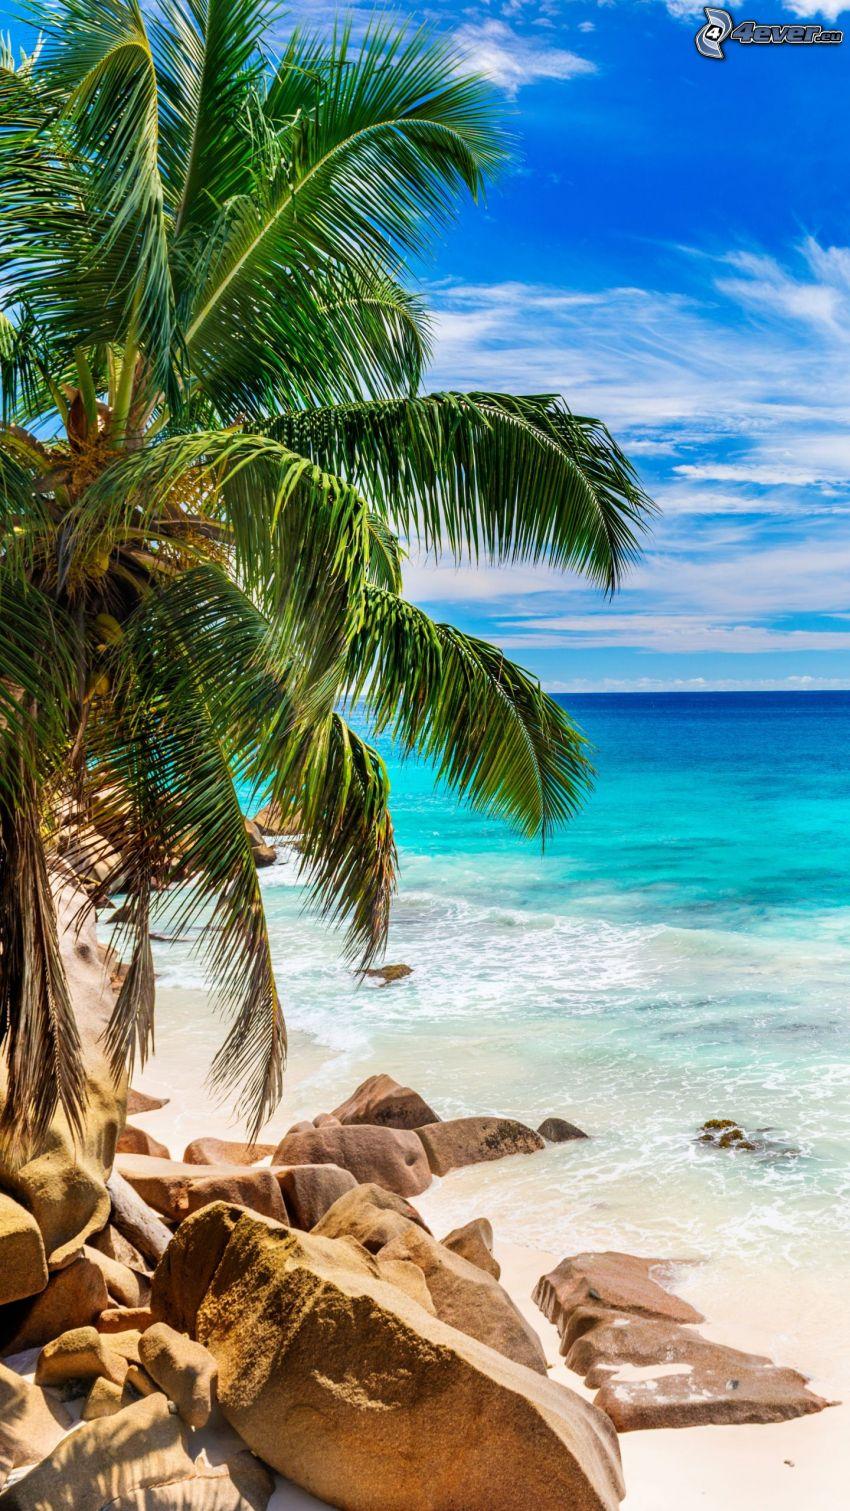 kust, klippor, palm, öppet hav